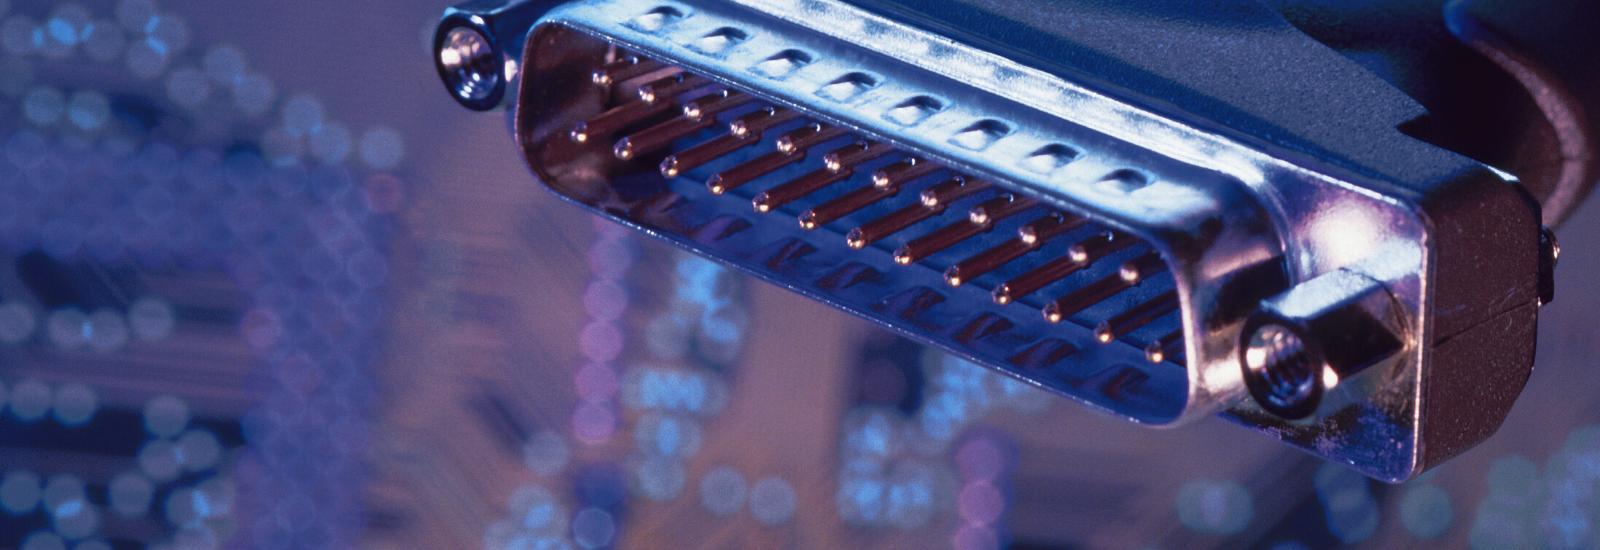 connettori elettrici lubrificazione riduzione forze inserzione